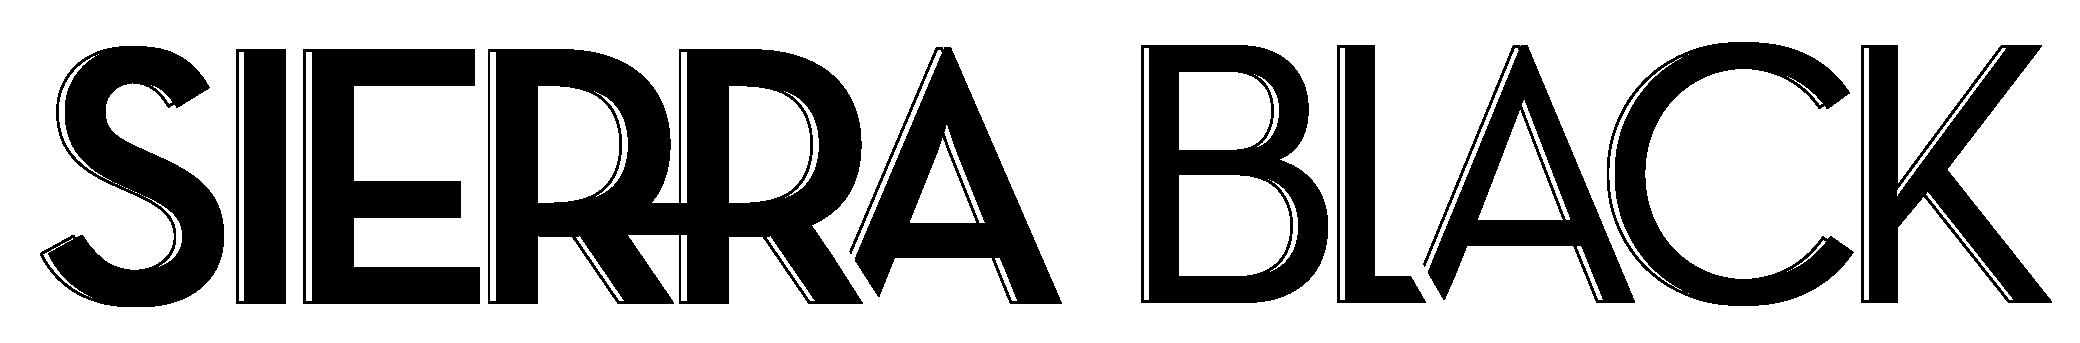 SB-Horizontal-Logo-Black.png